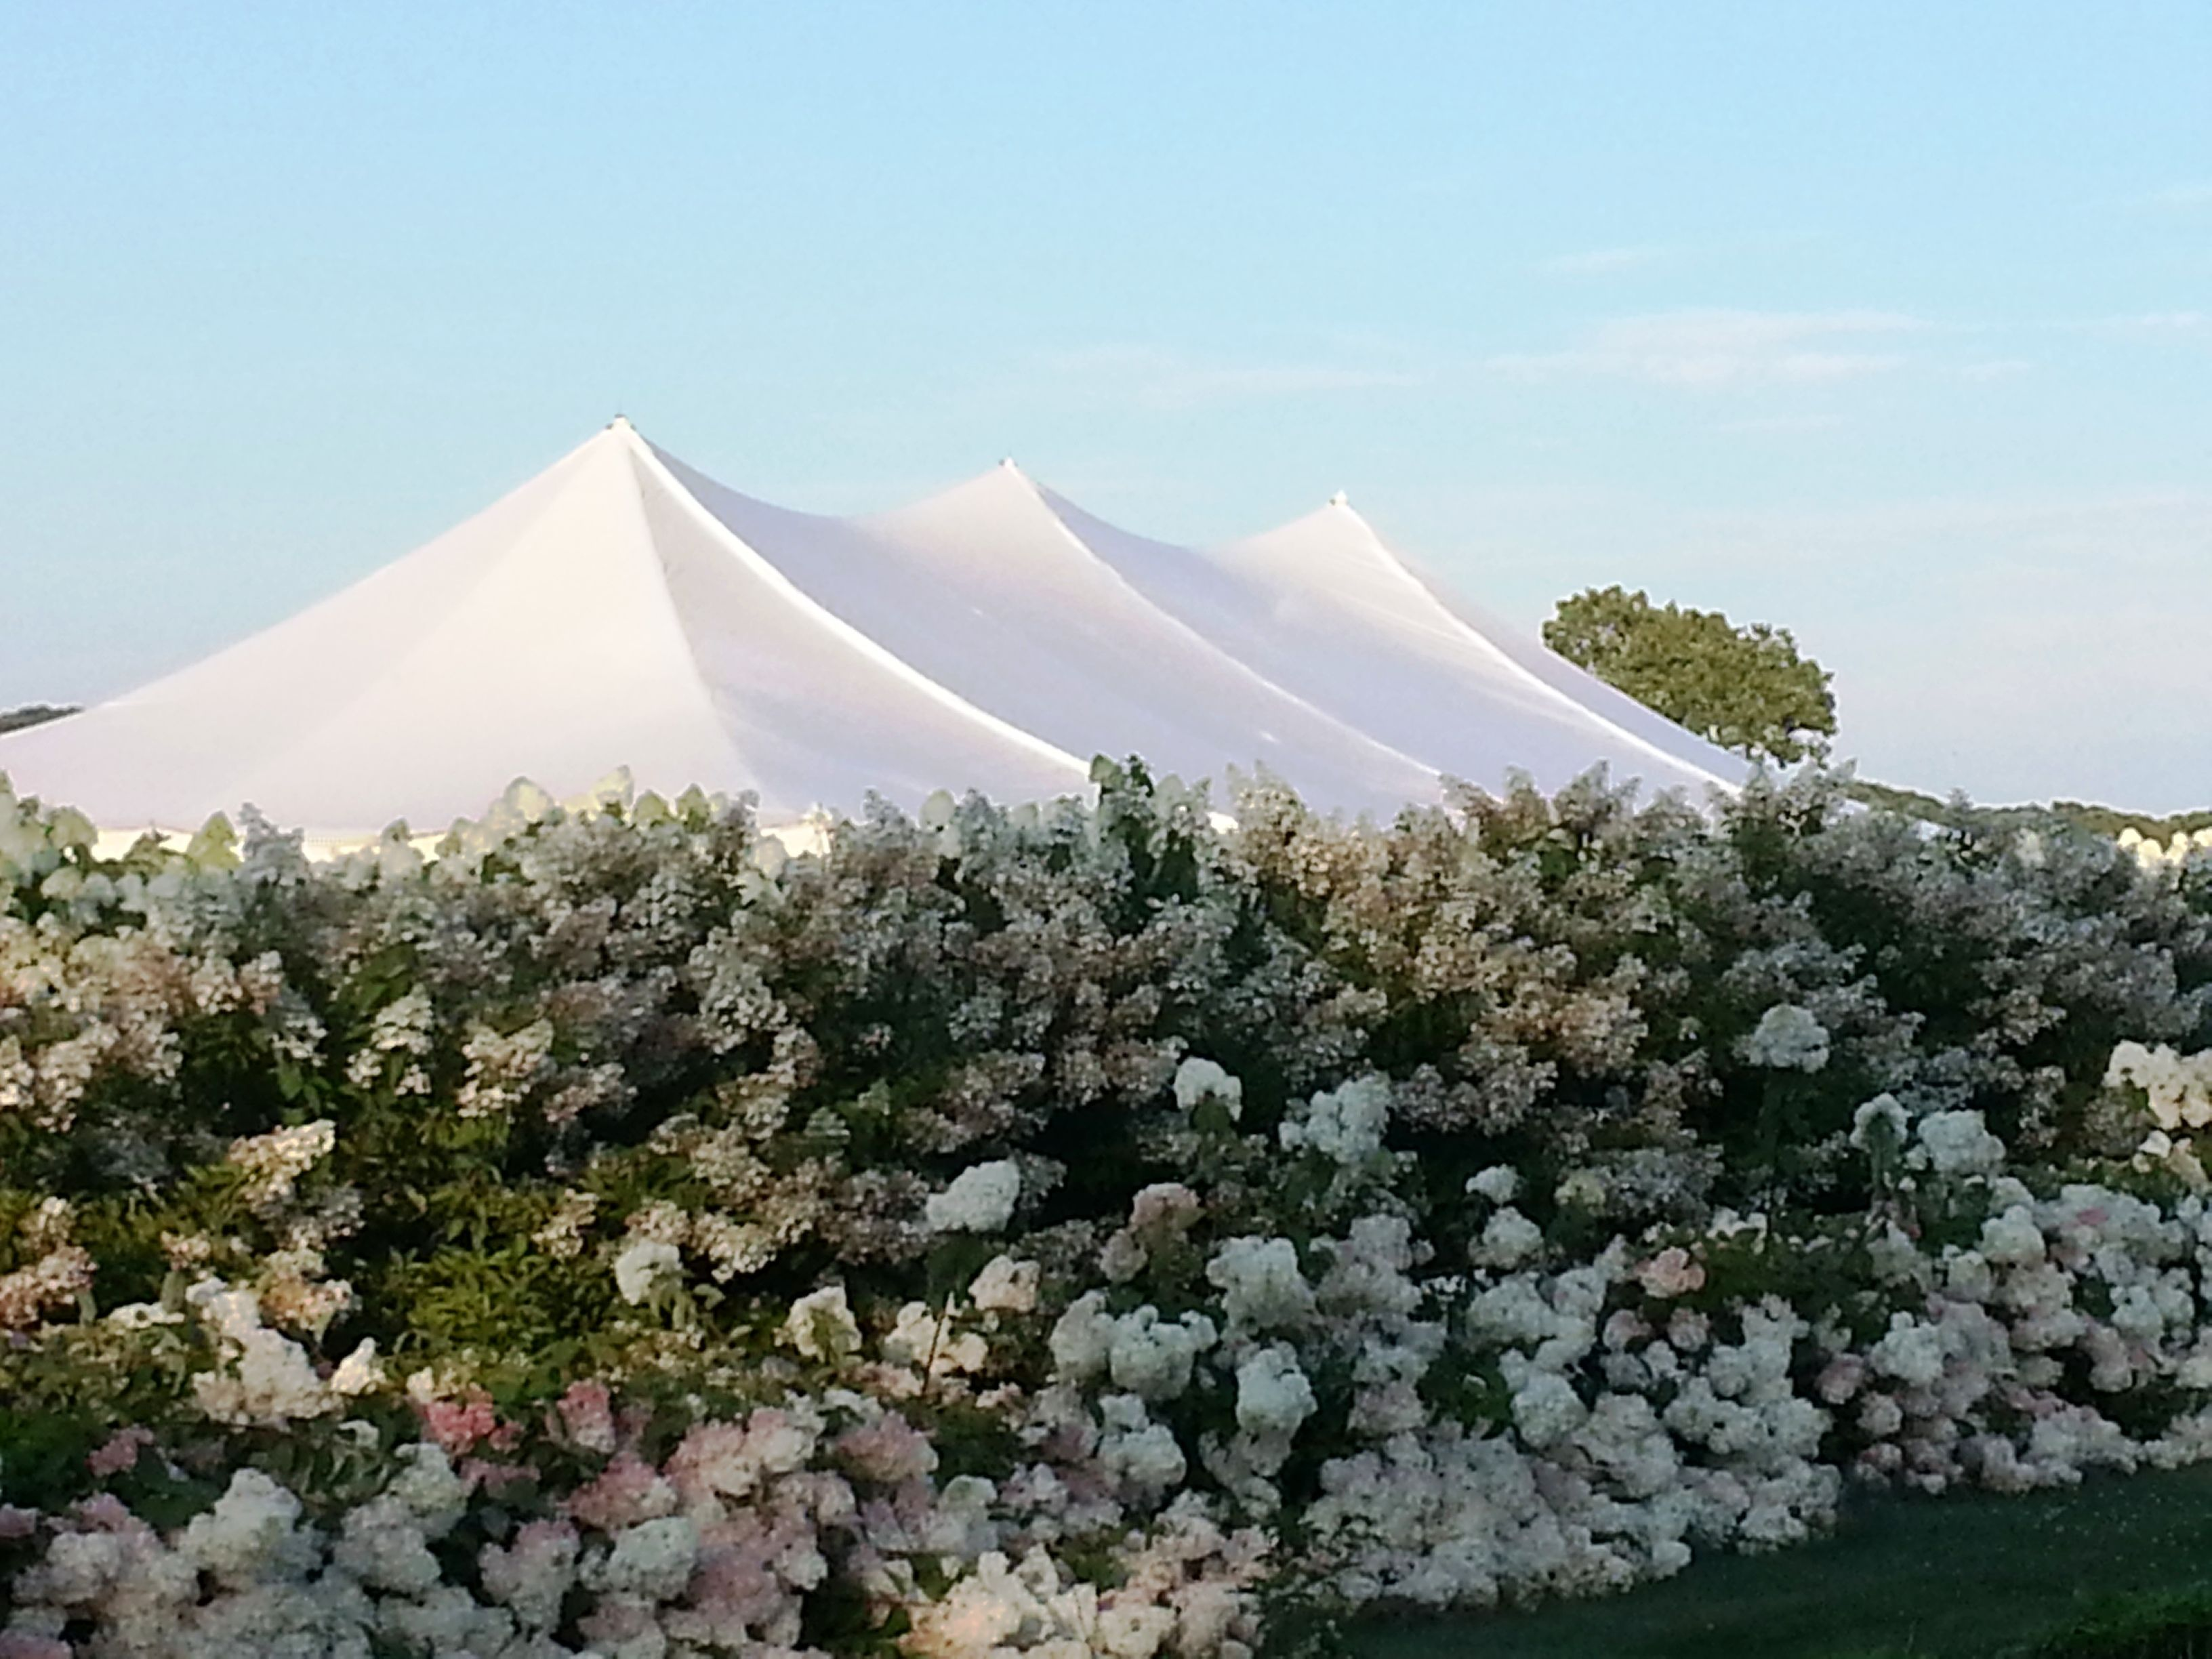 Wedding At Salt Air Farm On Long Island The 40 X 80 Tent Was Installed Along The Beautiful Hydrangea That Were Tent Wedding Backyard Wedding Wedding Rentals